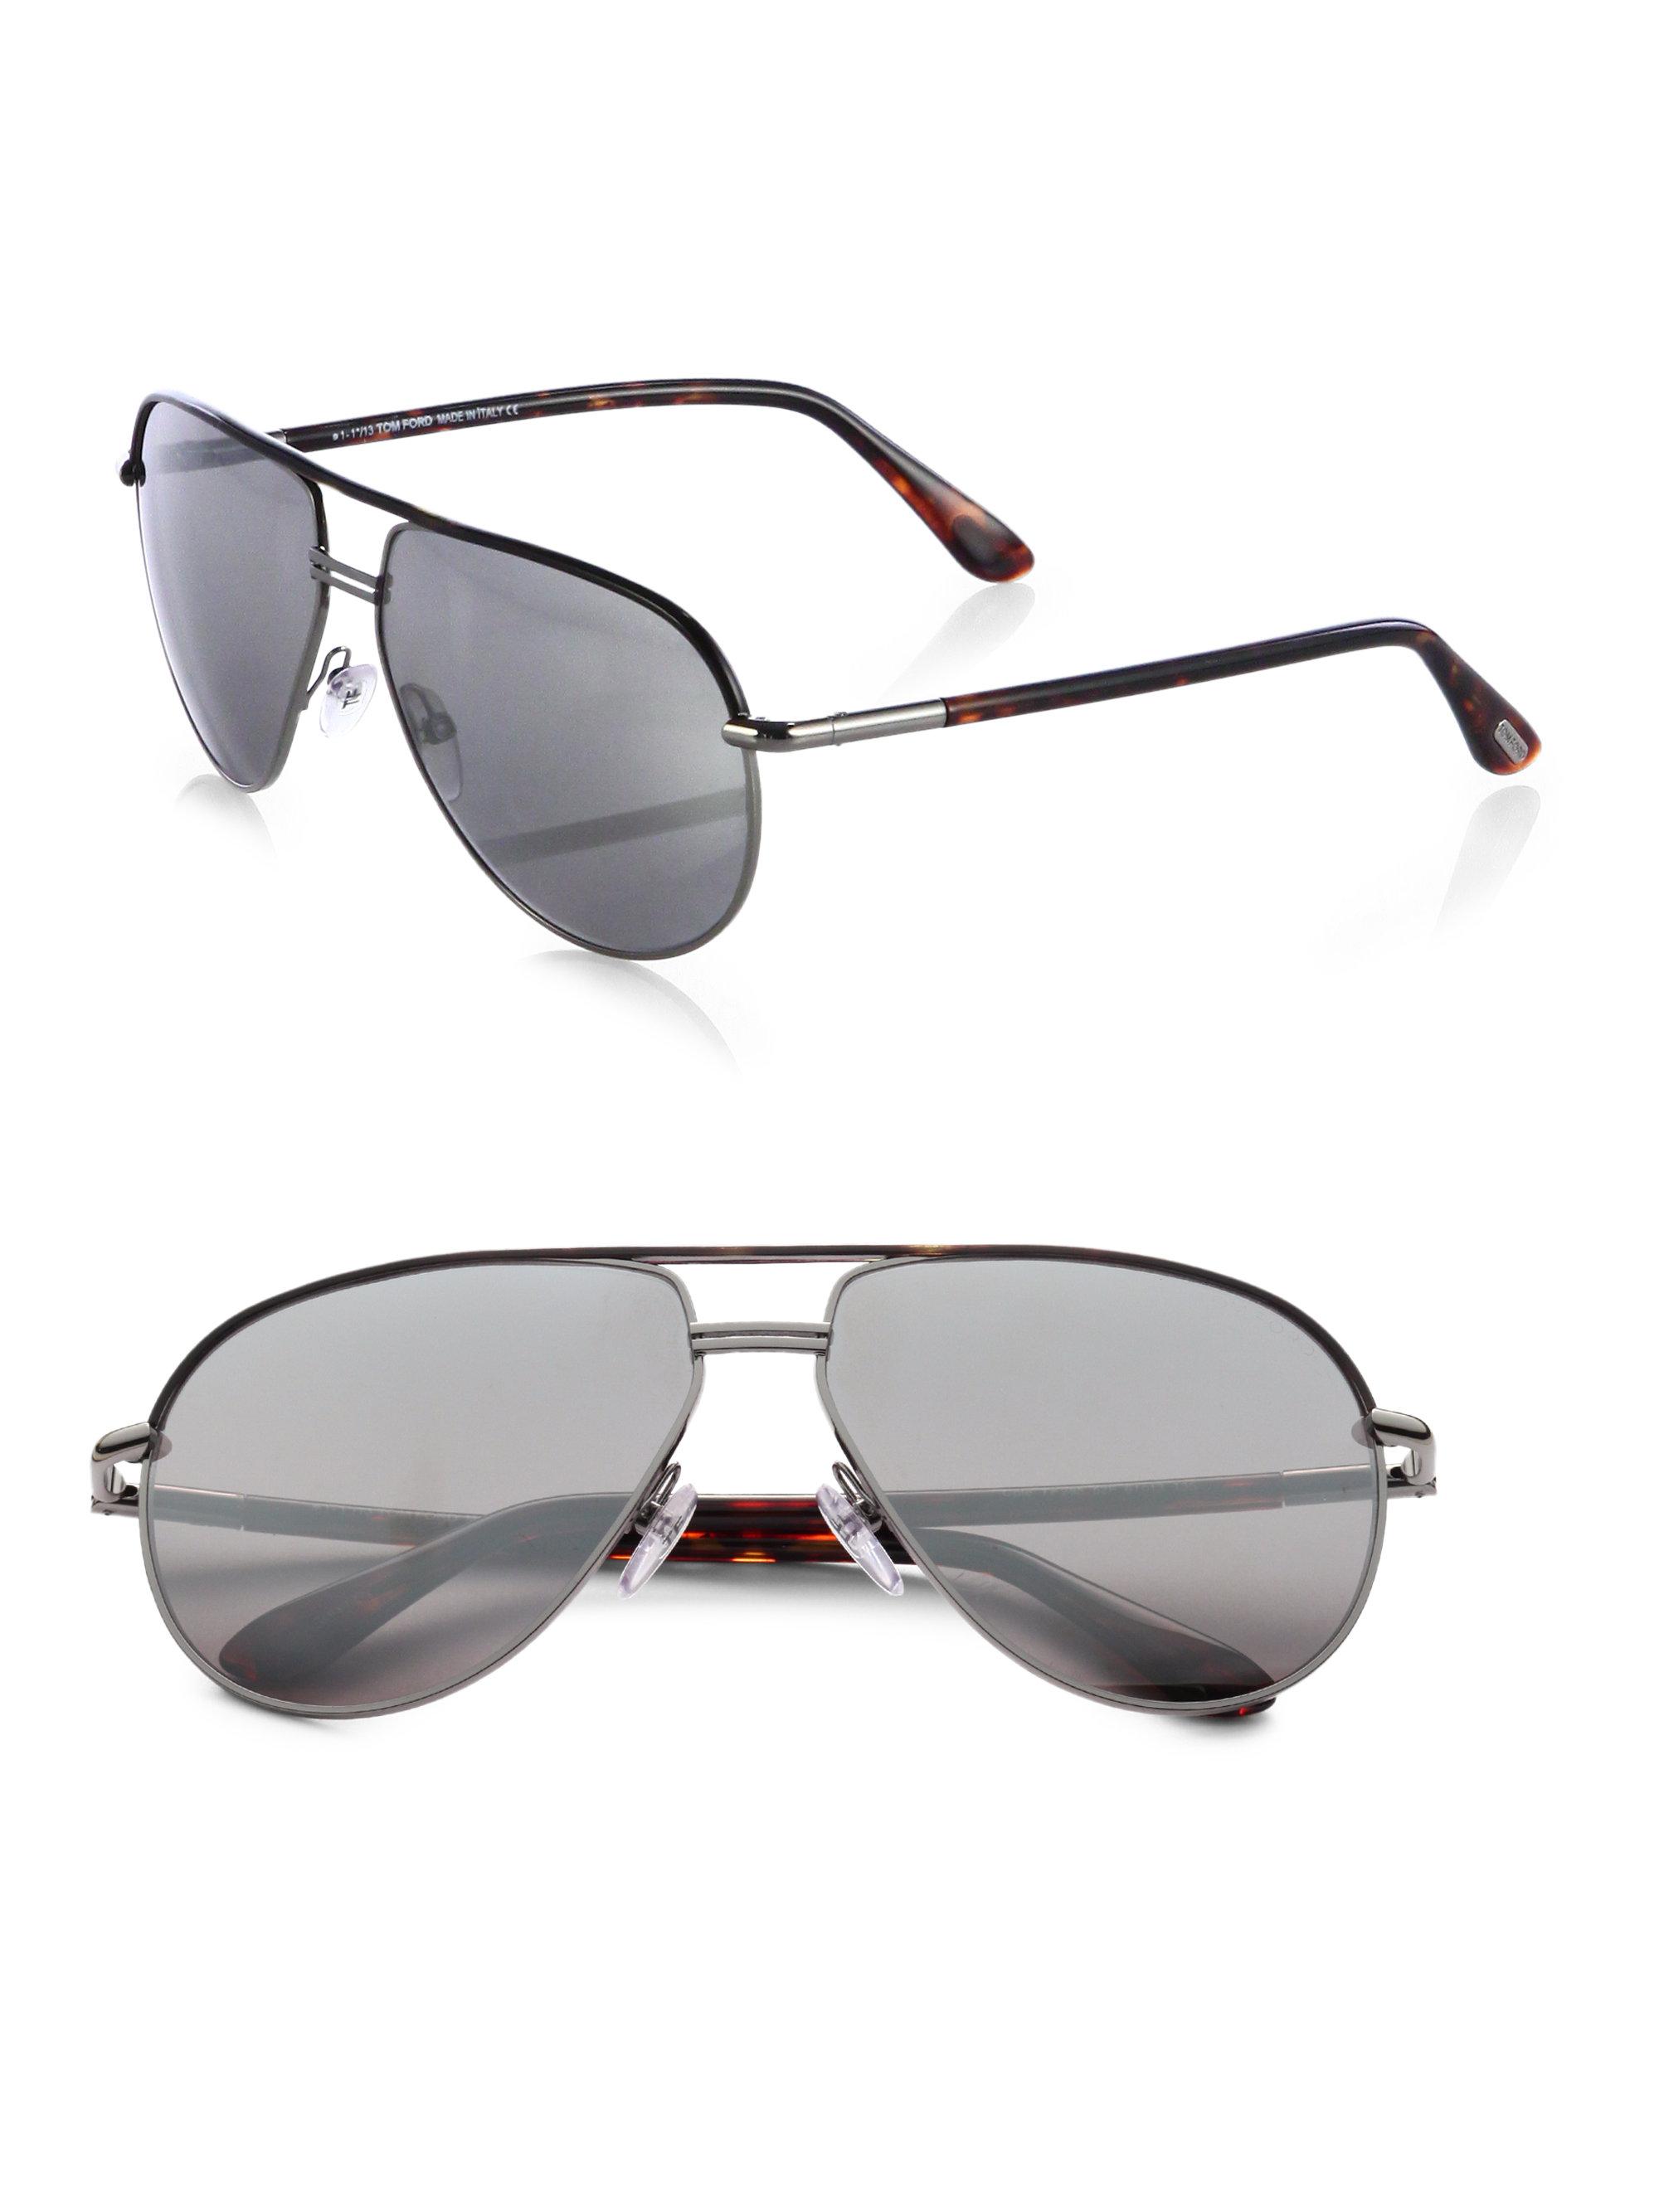 5a5bac5e9a7 Tom Ford Cole Sunglasses - Bitterroot Public Library